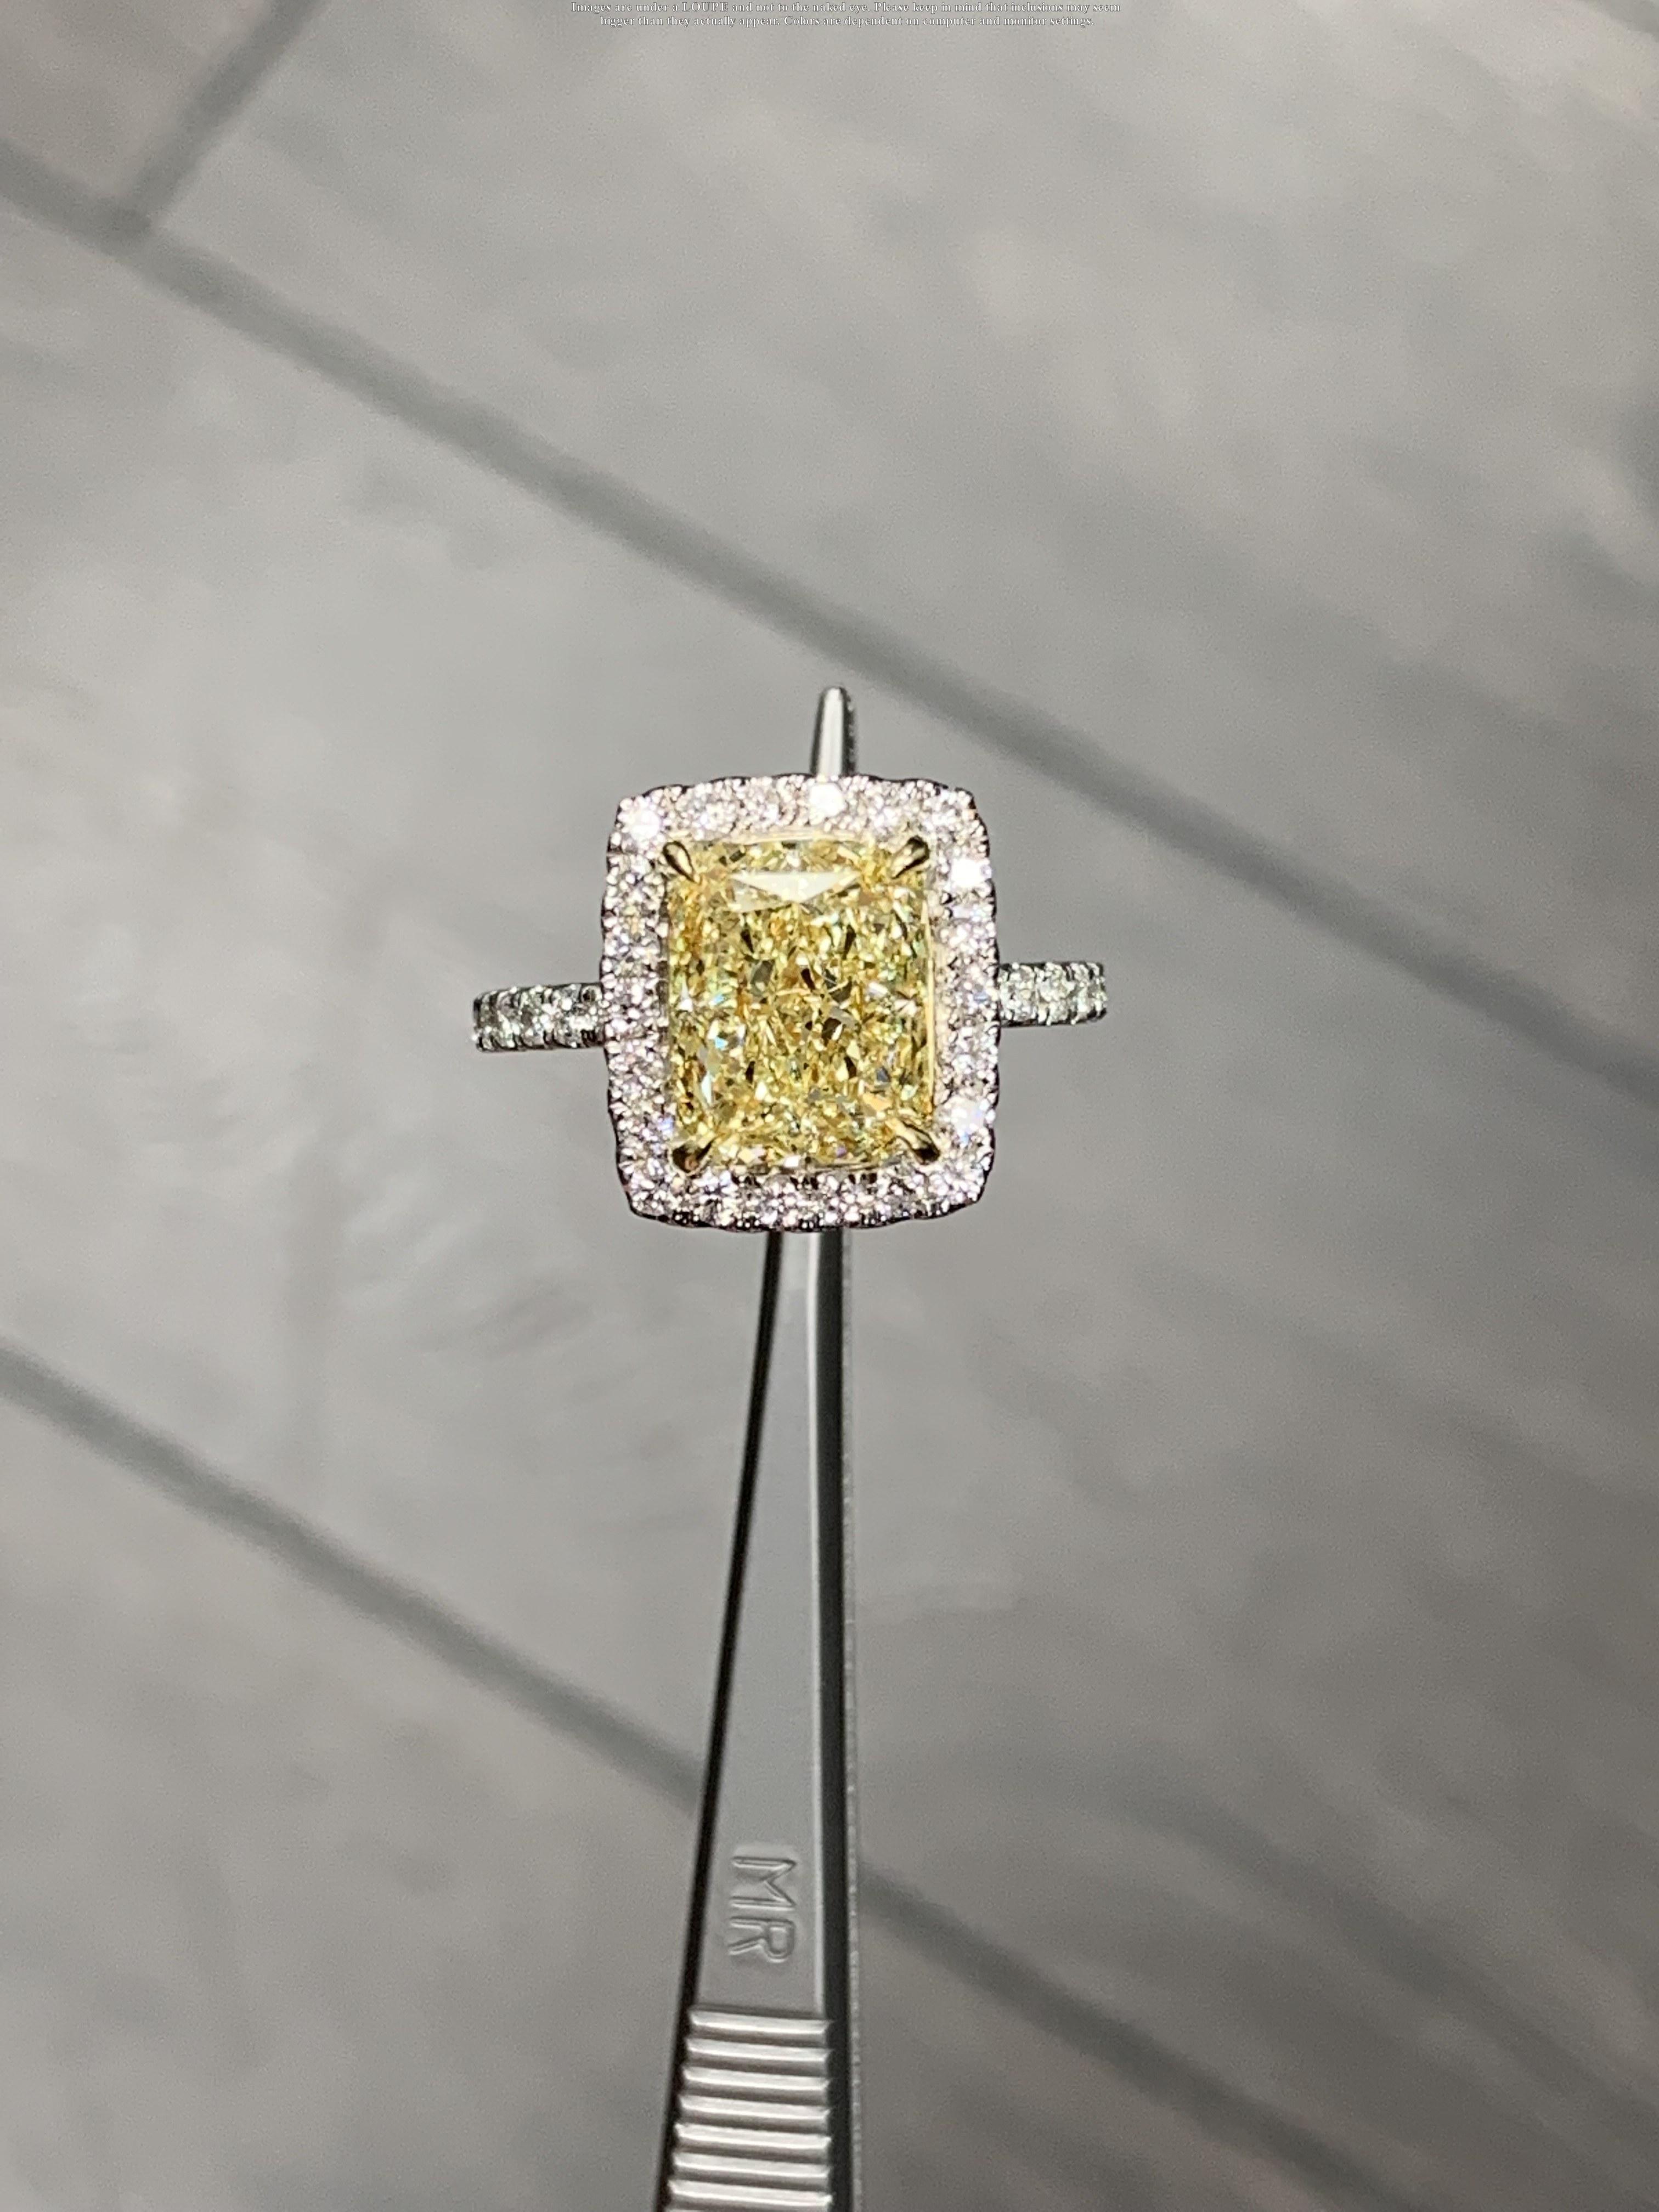 Gumer & Co Jewelry - Diamond Image - D01603